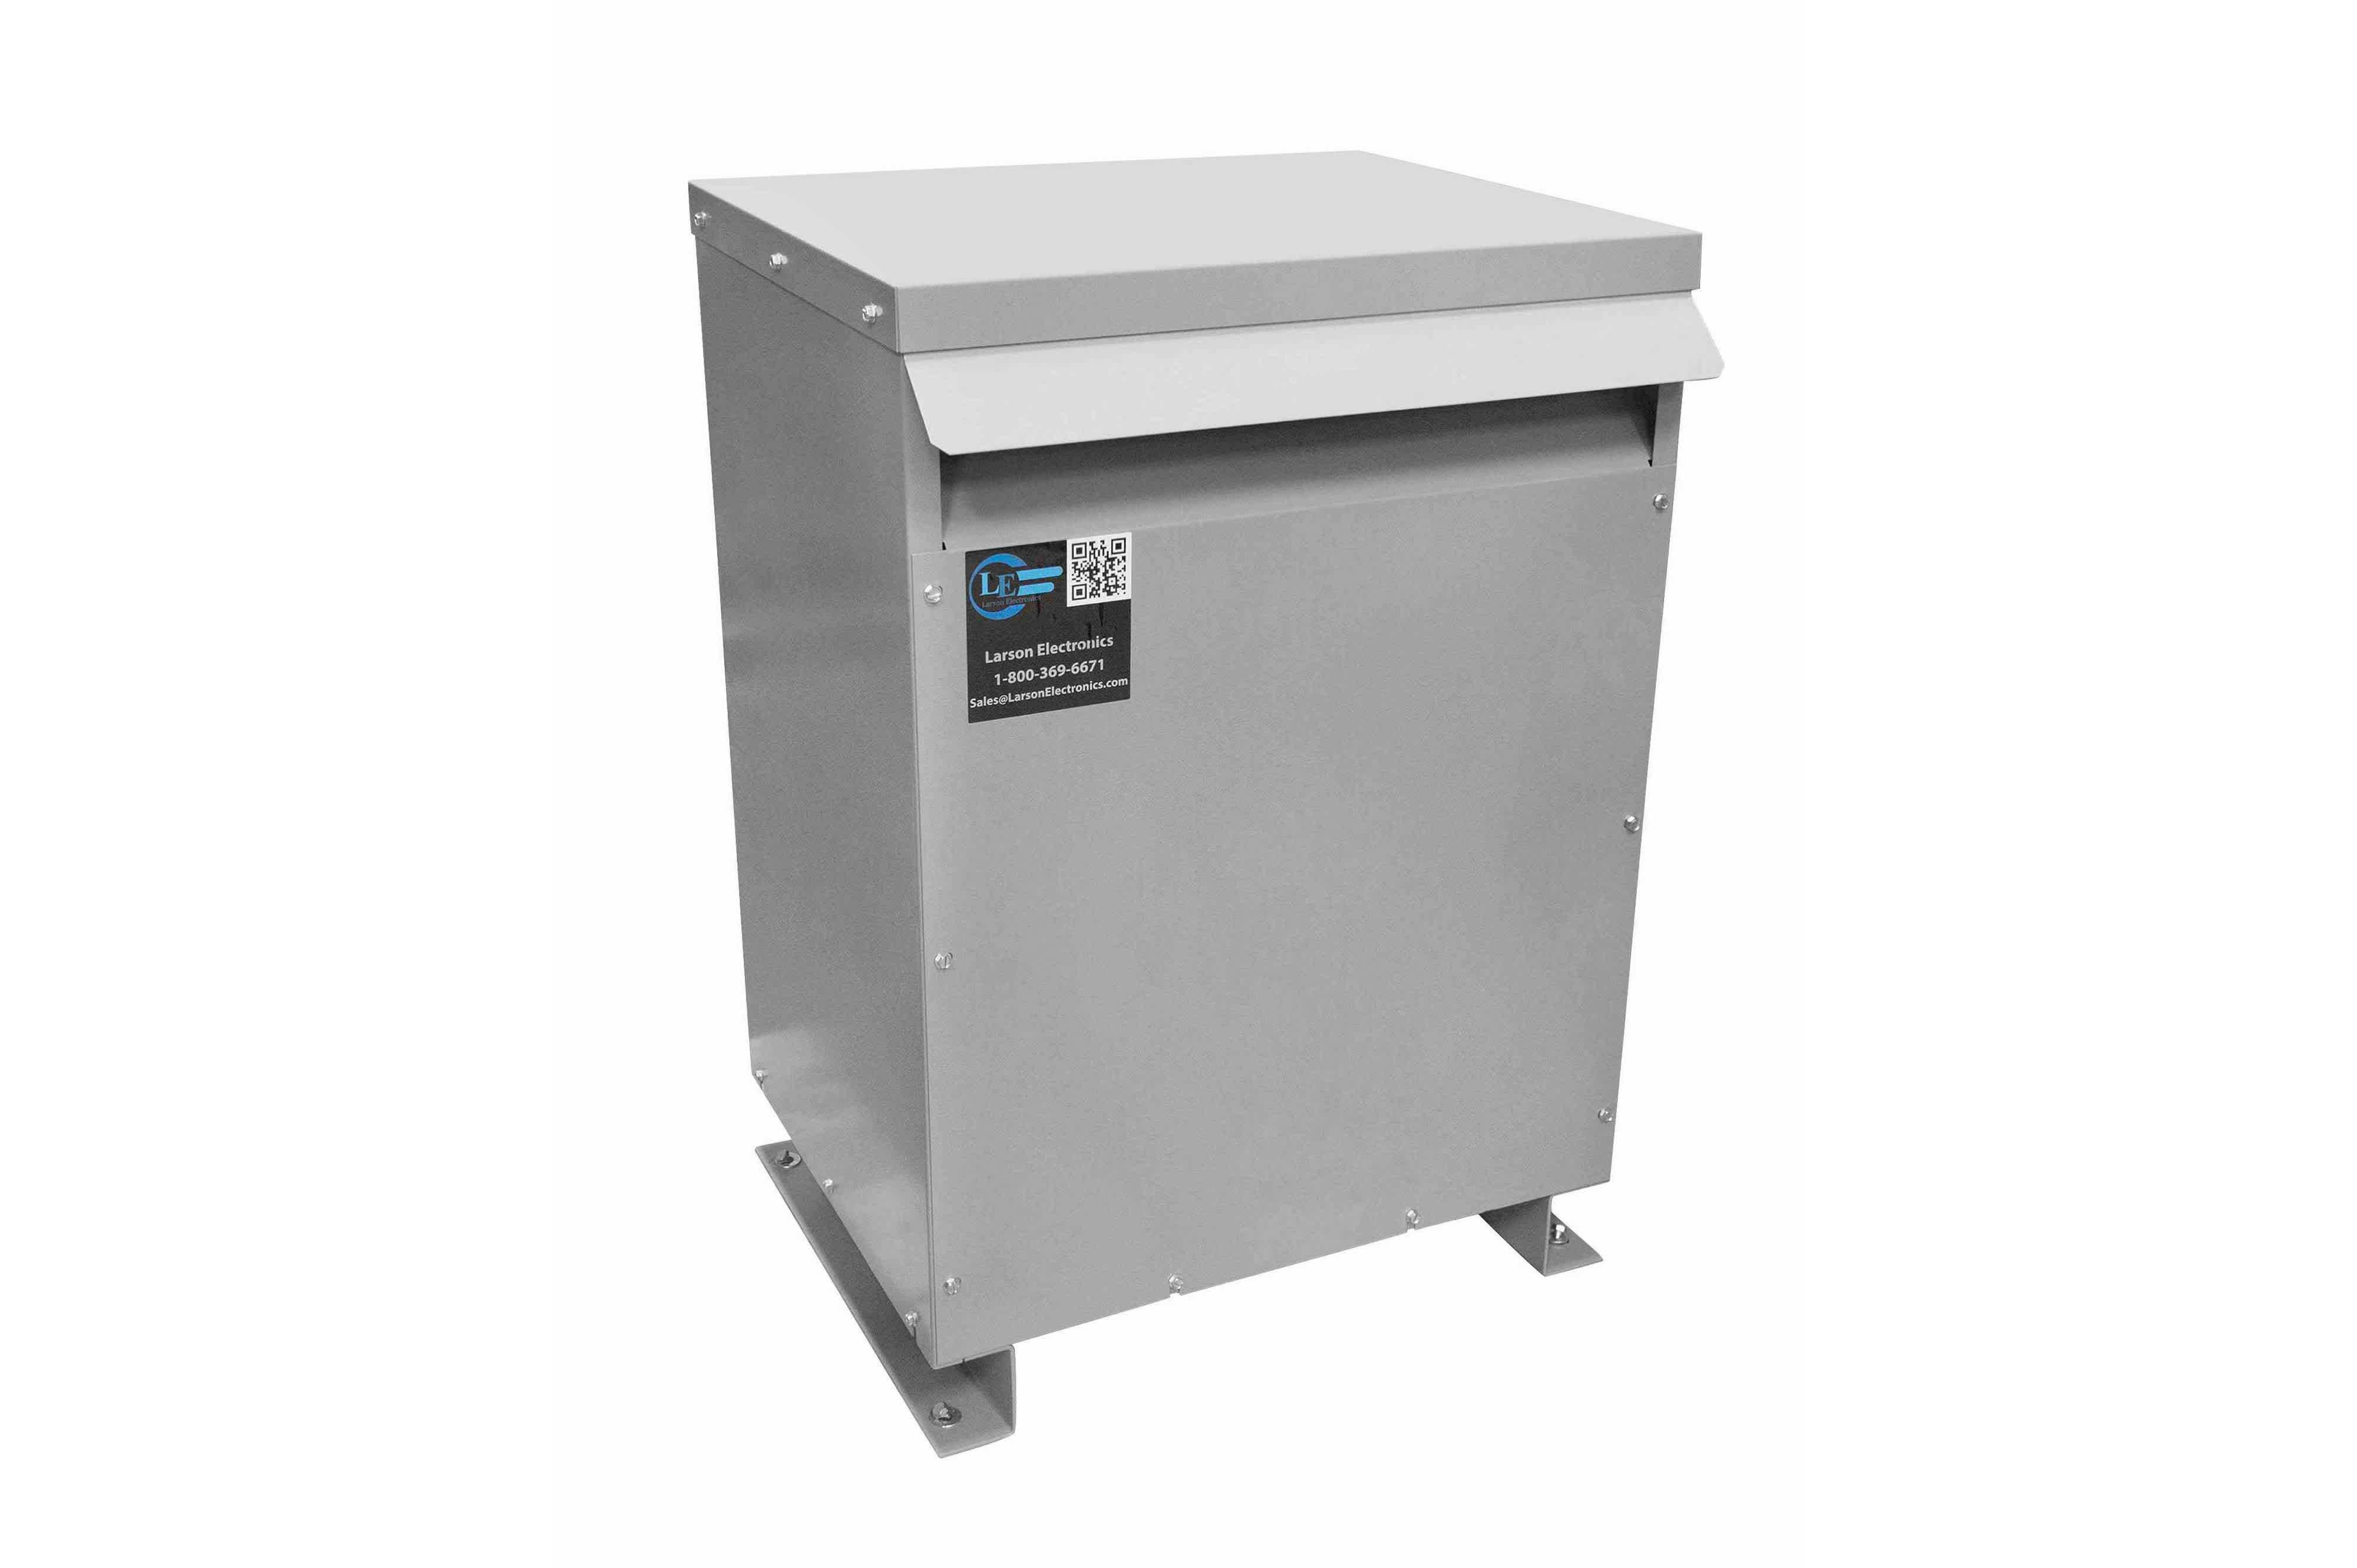 47.5 kVA 3PH Isolation Transformer, 480V Wye Primary, 380Y/220 Wye-N Secondary, N3R, Ventilated, 60 Hz